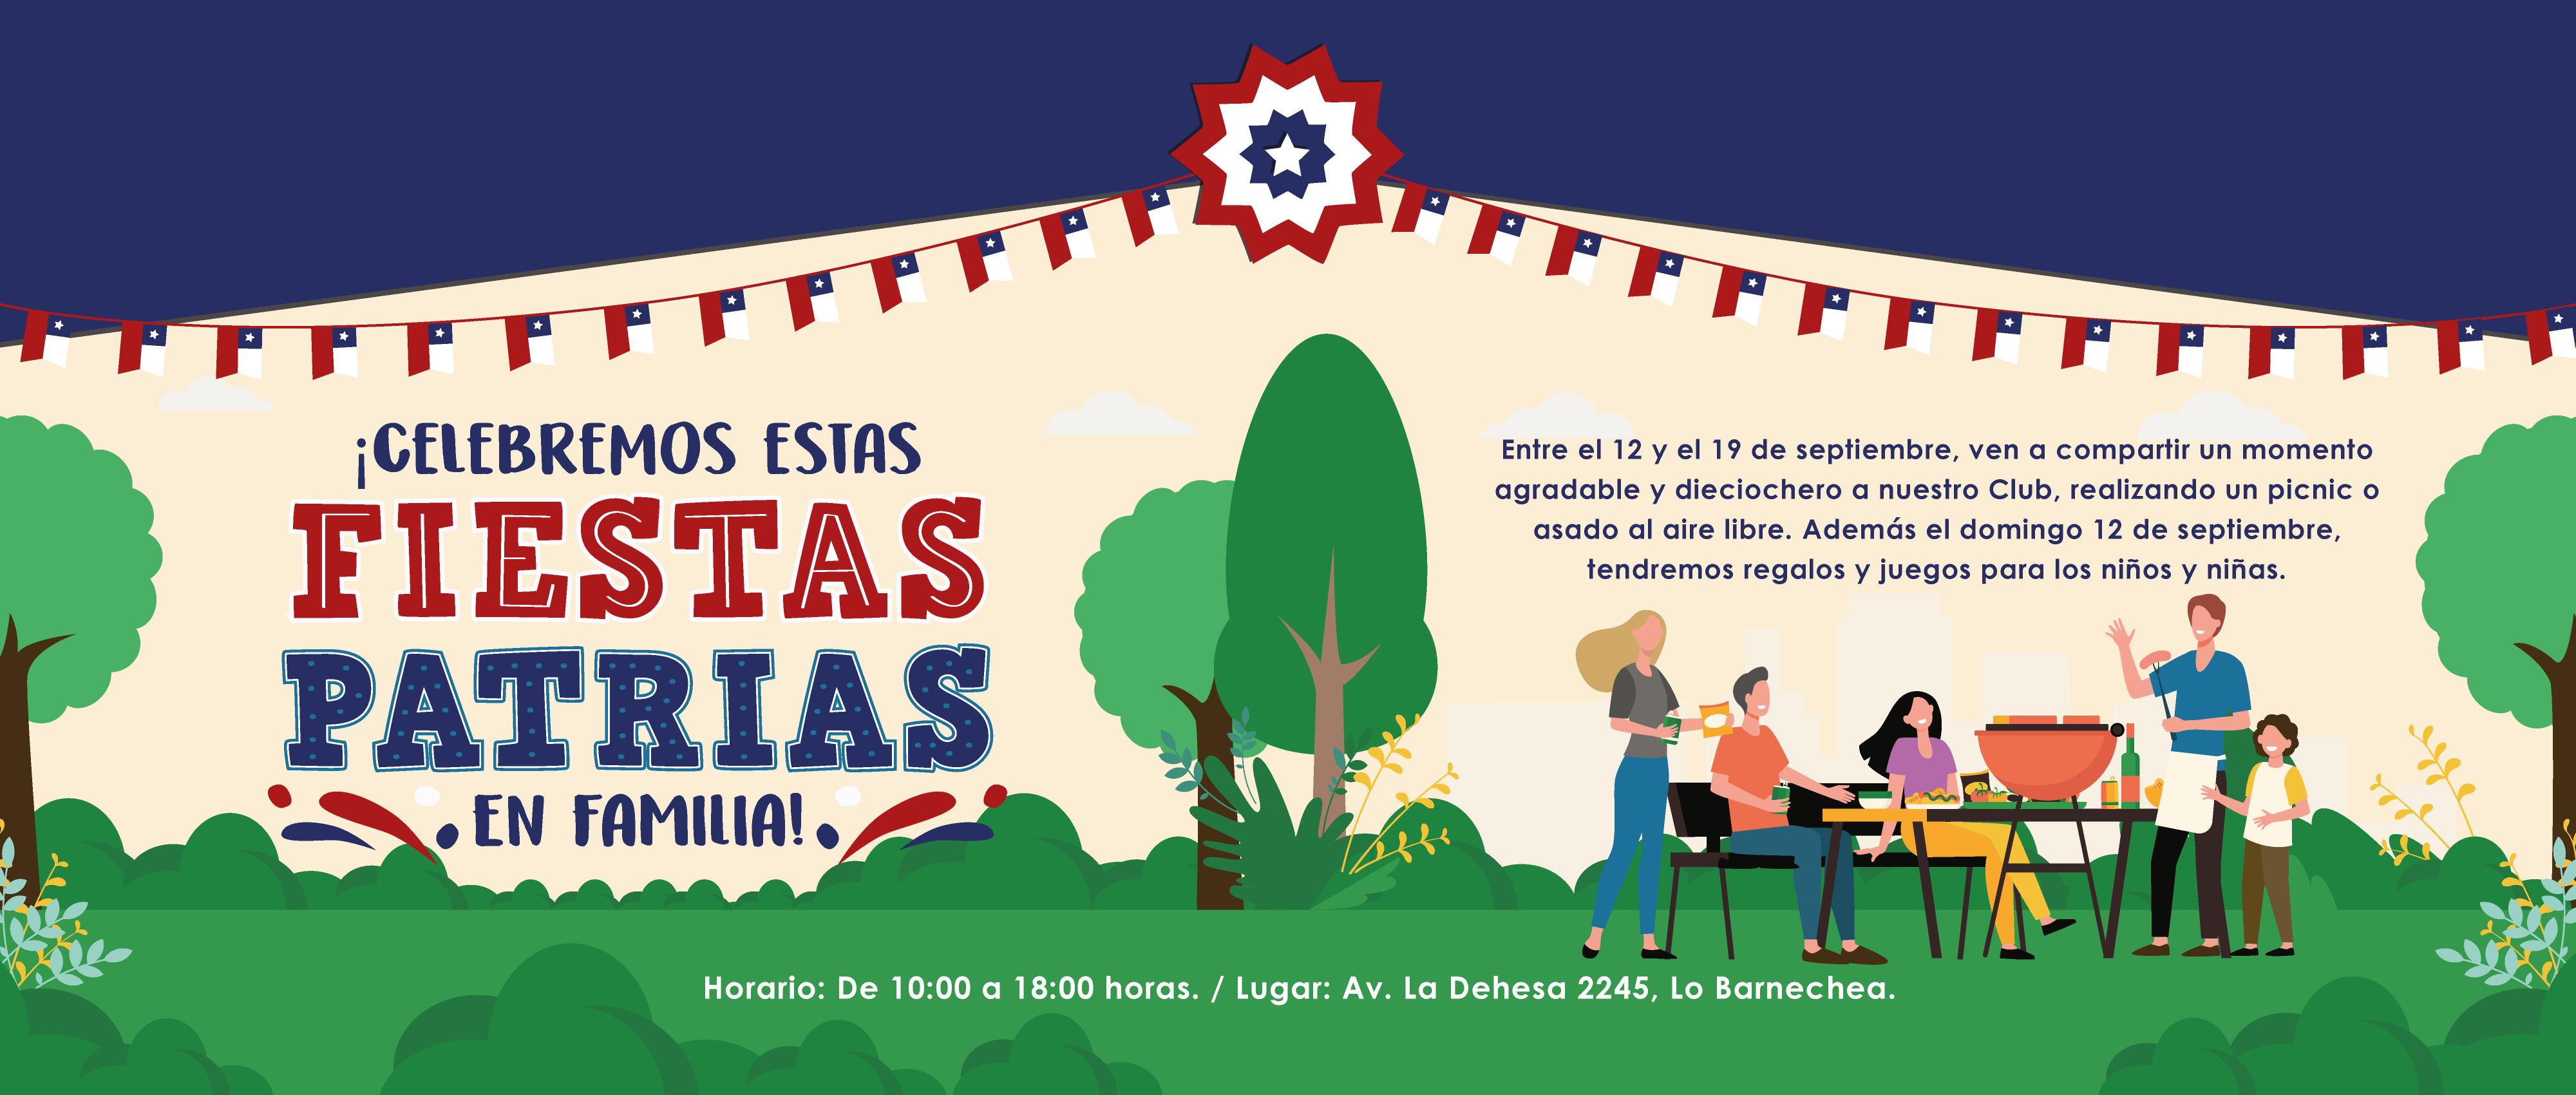 Banner-FiestasPatrias-CubMedico-V2